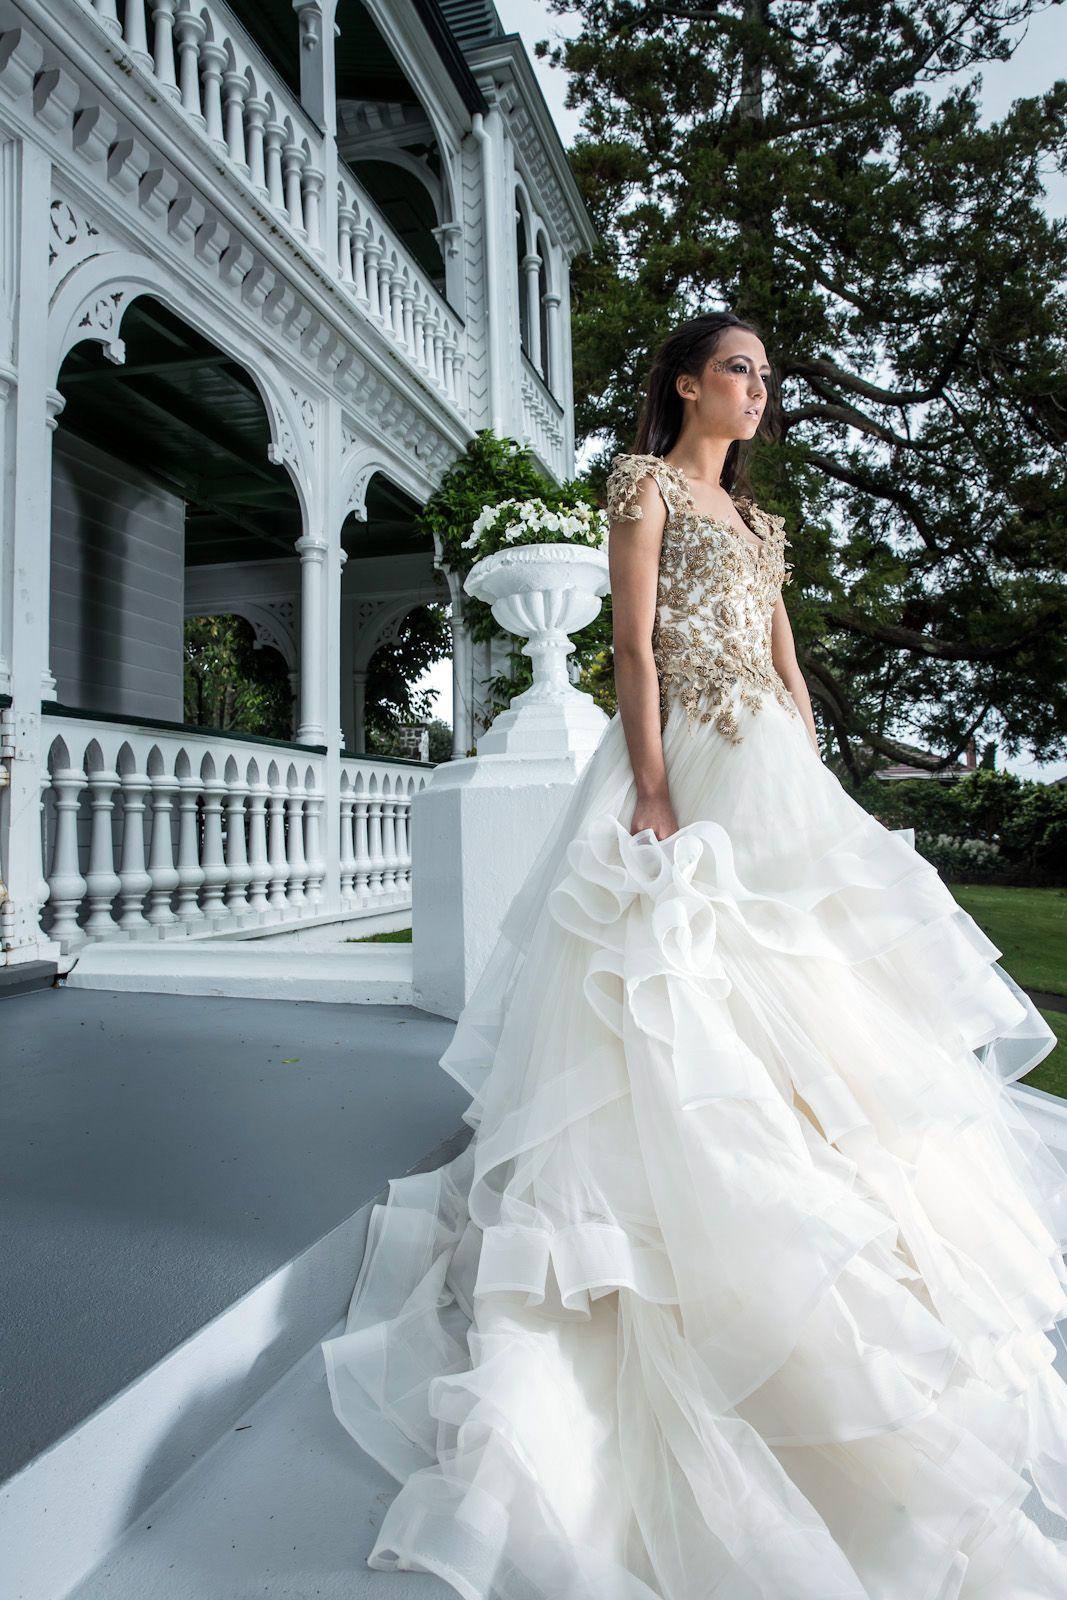 uks leading bridal designer - HD1067×1600